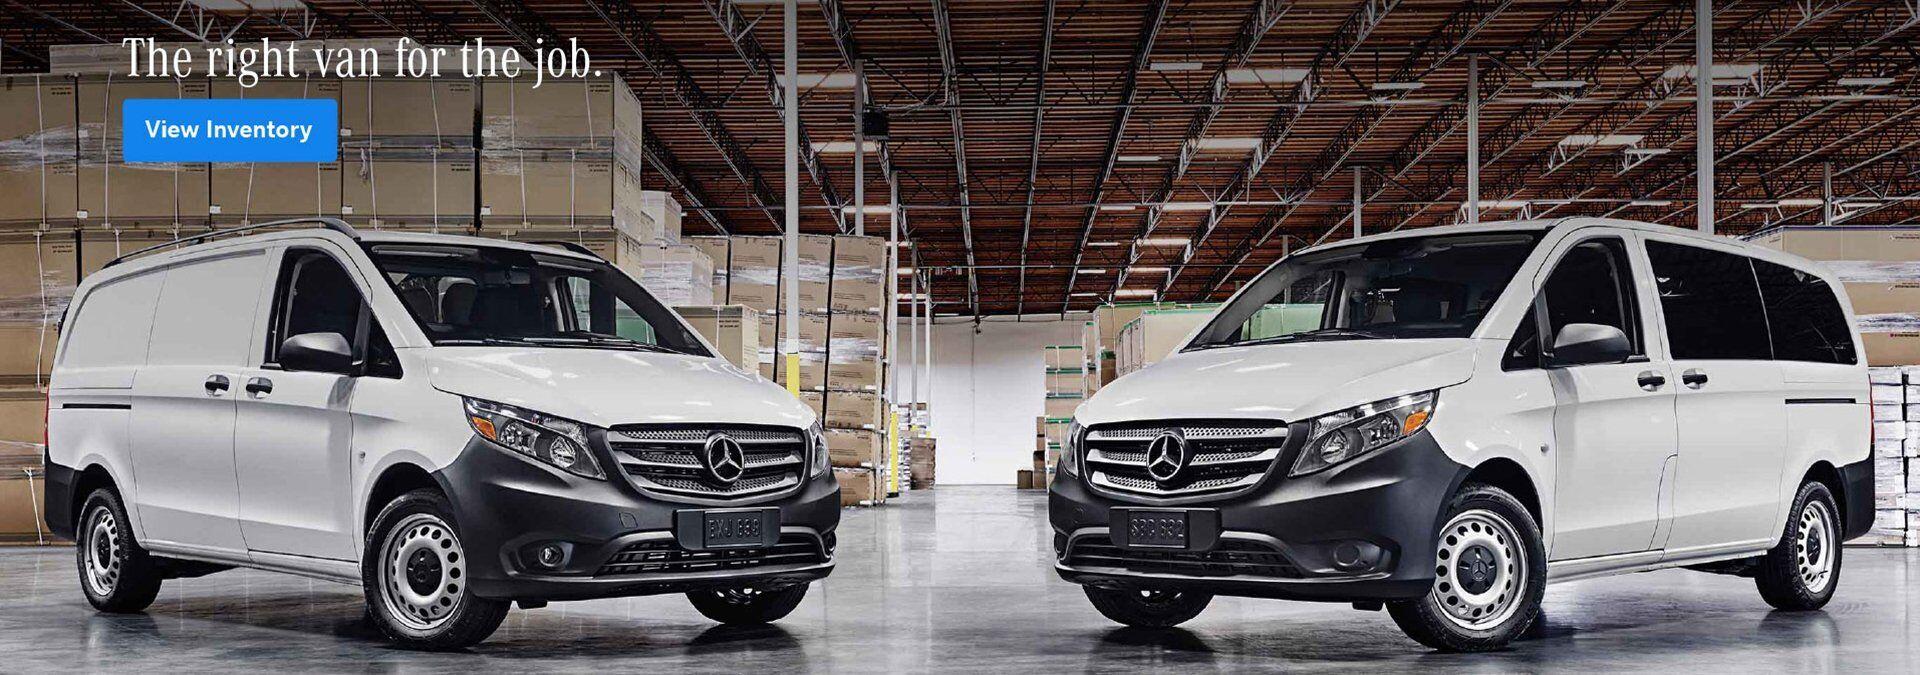 John Sisson Motors Mercedes Benz Dealership In Washington Pa